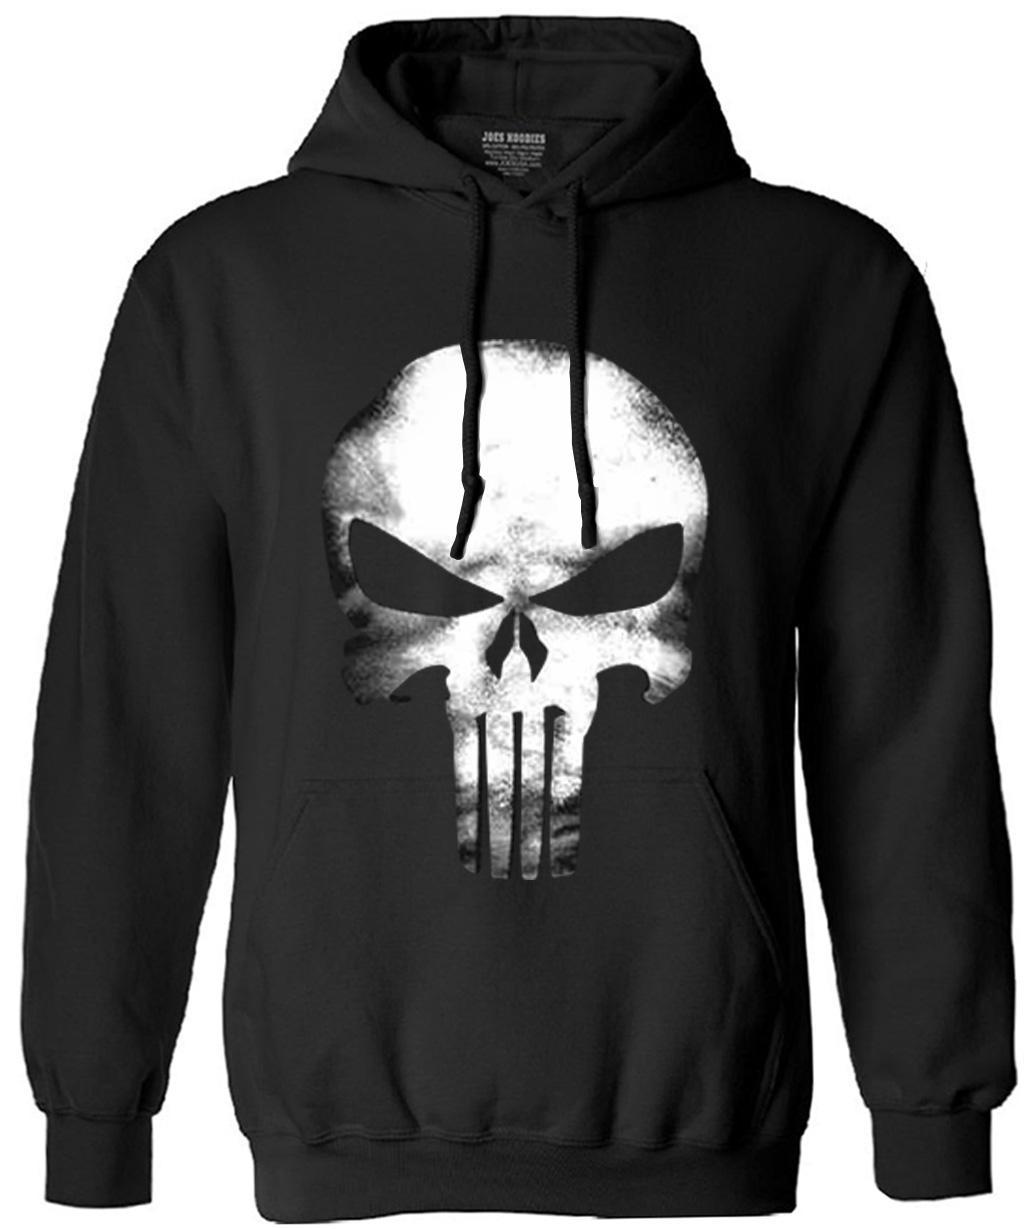 21ea8a65254acc 2019 The Punisher Skull Long Sleeve Fleece Hip Hop Streetwear Hoodies Men  Funny Sweatshirt 2017 Autumn New Fashion Hoodie Man Clothes From  Clothingsupreme, ...